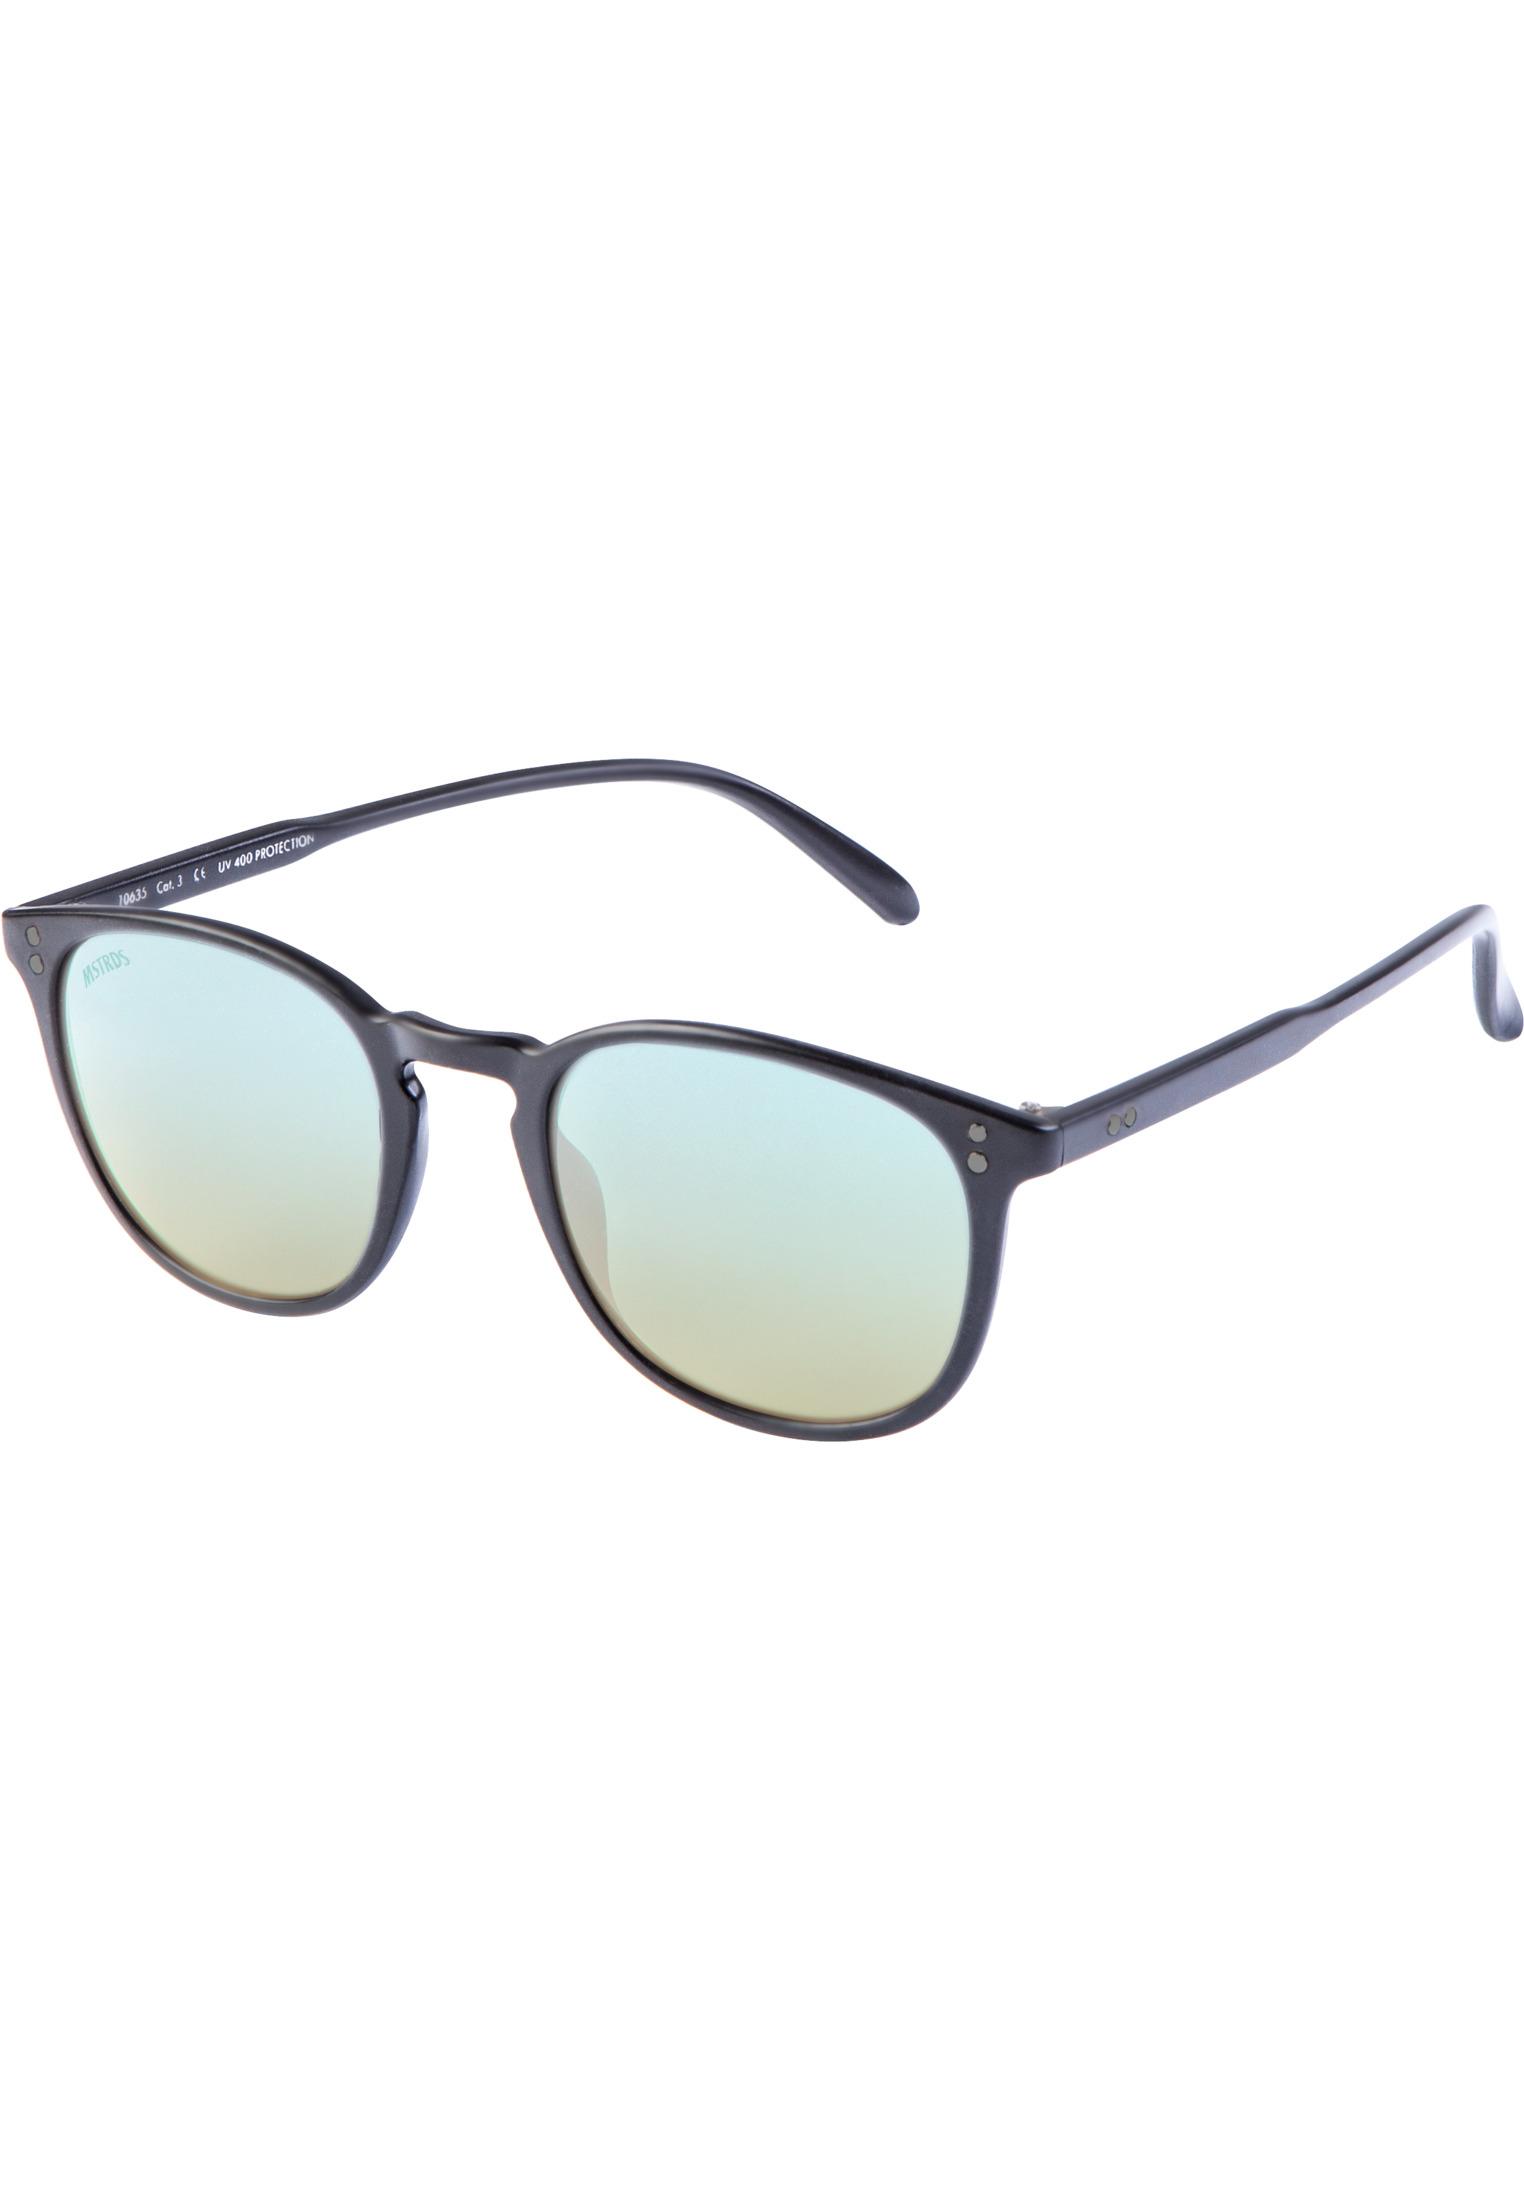 Master Dis Sunglasses Arthur blk/blue - One Size